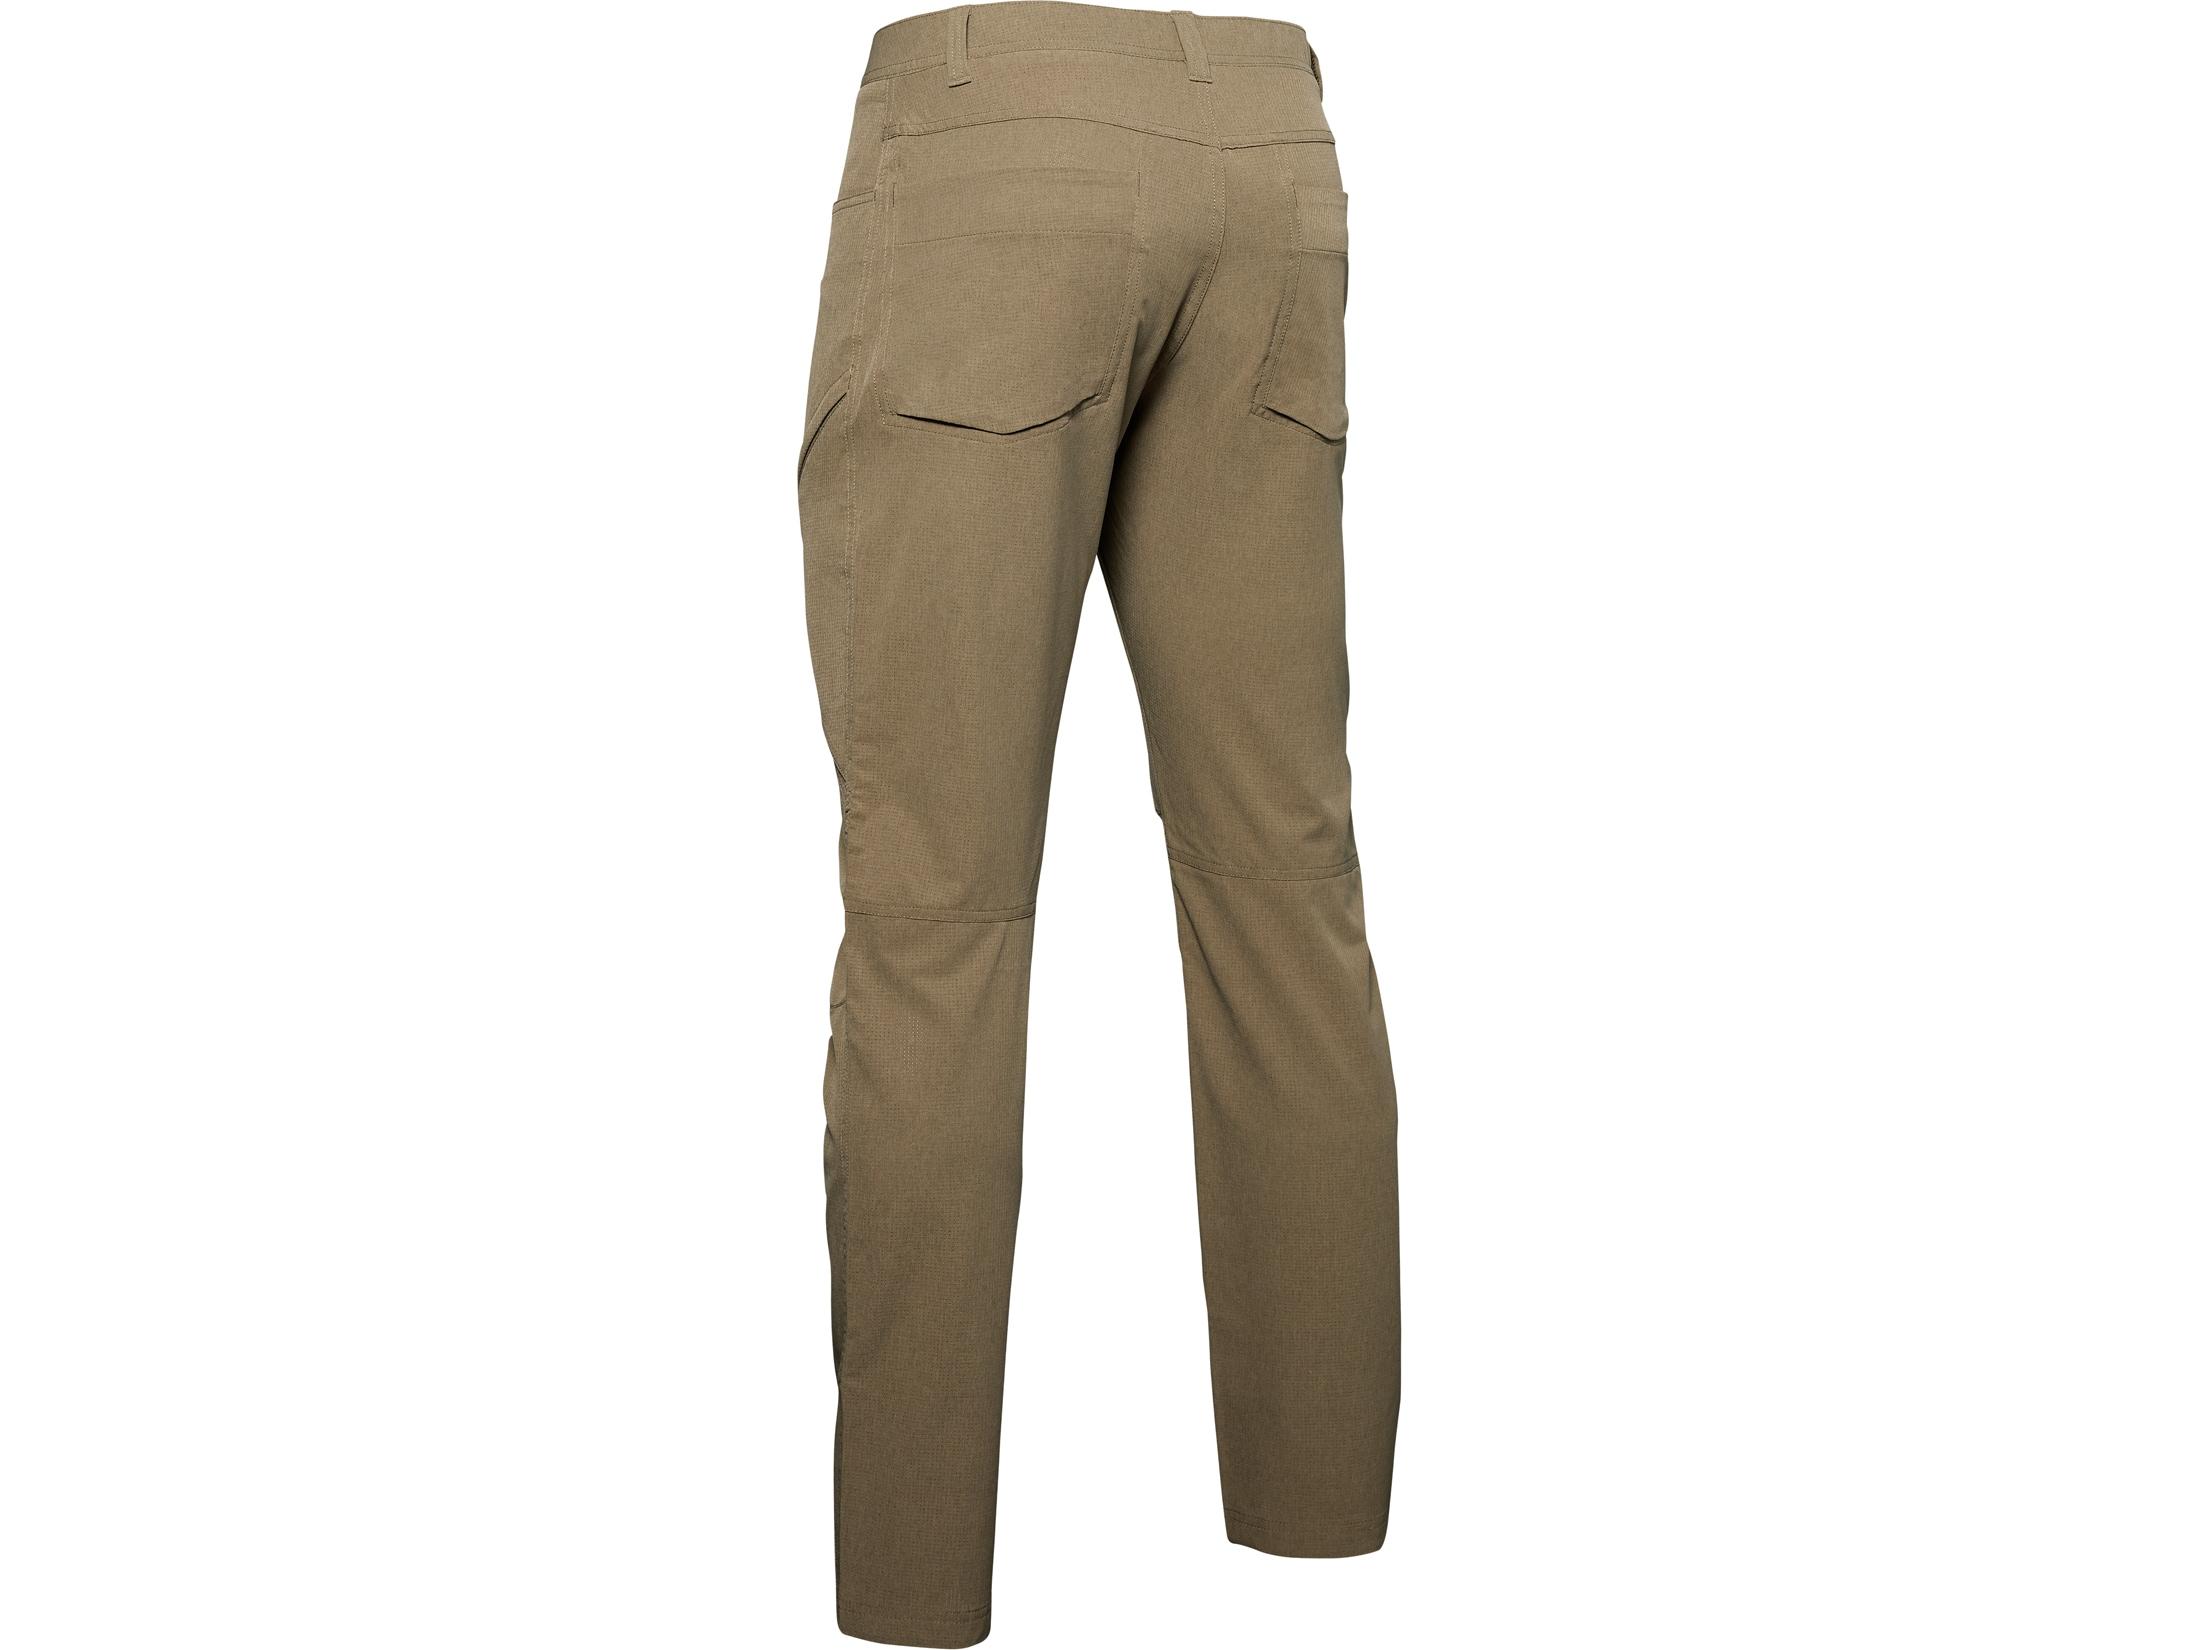 131e173bfa Under Armour Men's UA Adapt Pants Polyester